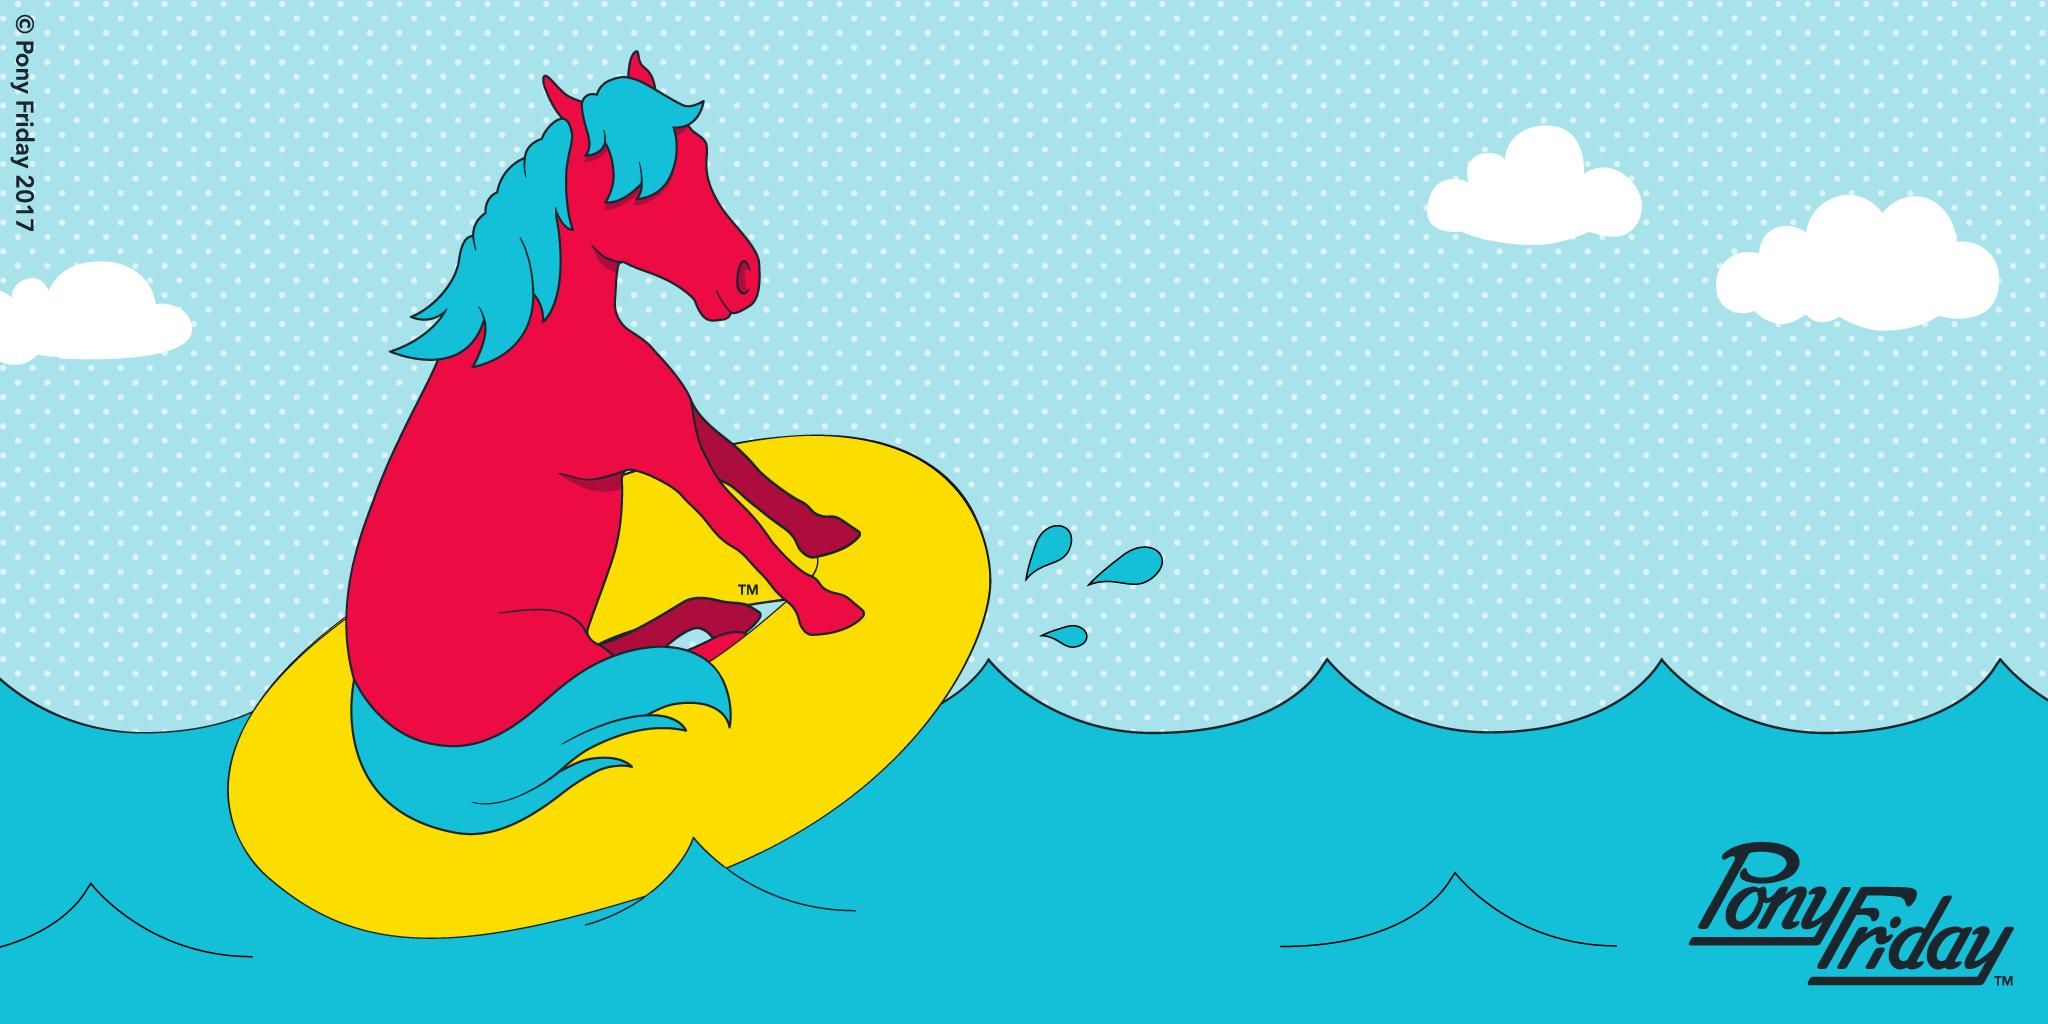 Pony-Friday-Water-Park-Pool-Fun-Splash-Summer-Clouds-Ocean-Innertube-Kicks-Blog-Post-Header-Image.png